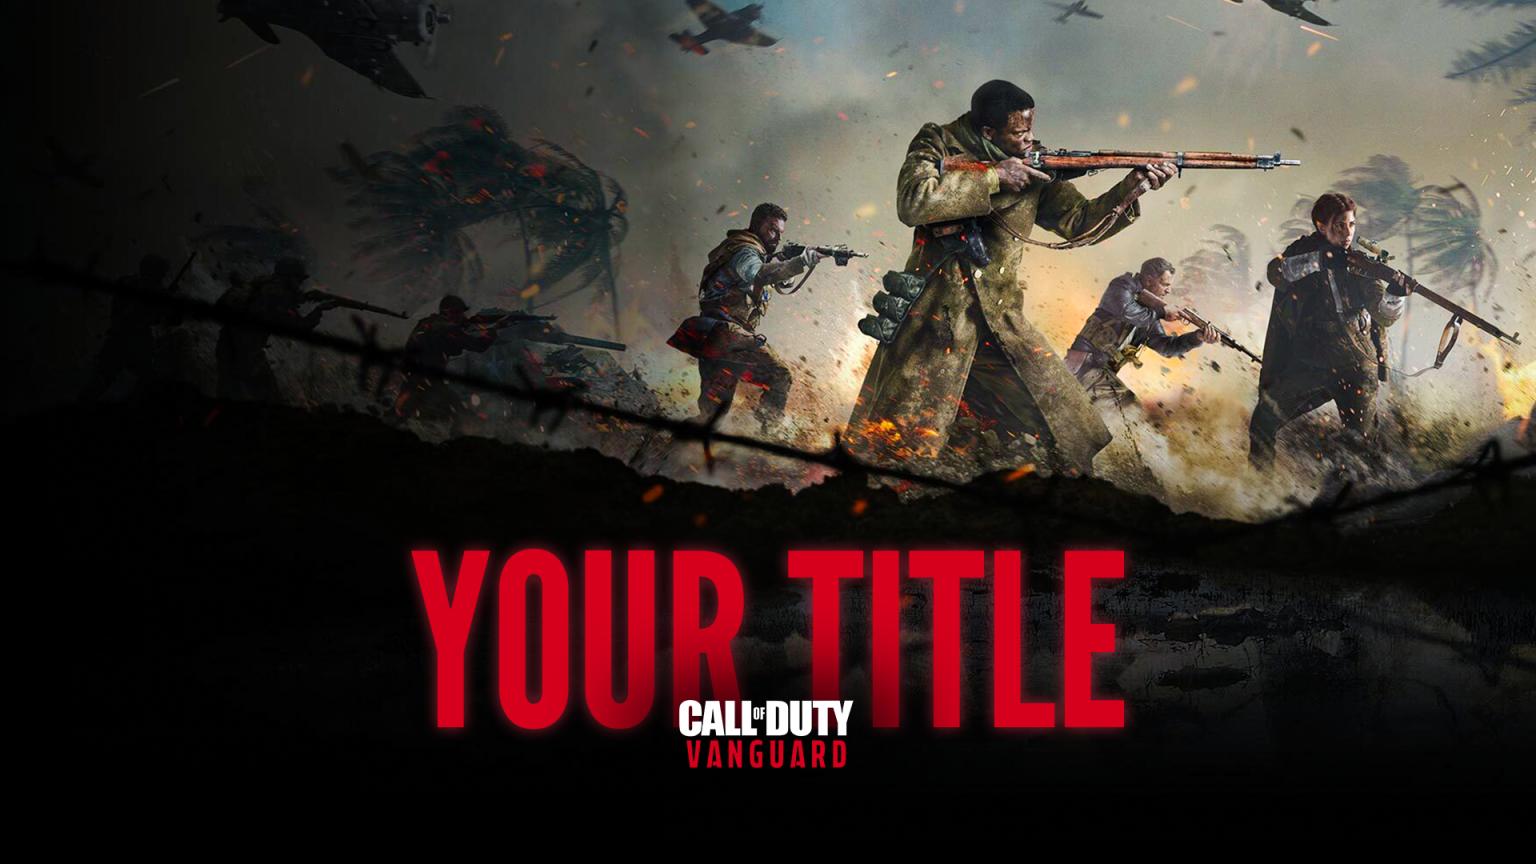 Call of Duty Vanguard Thumbnail